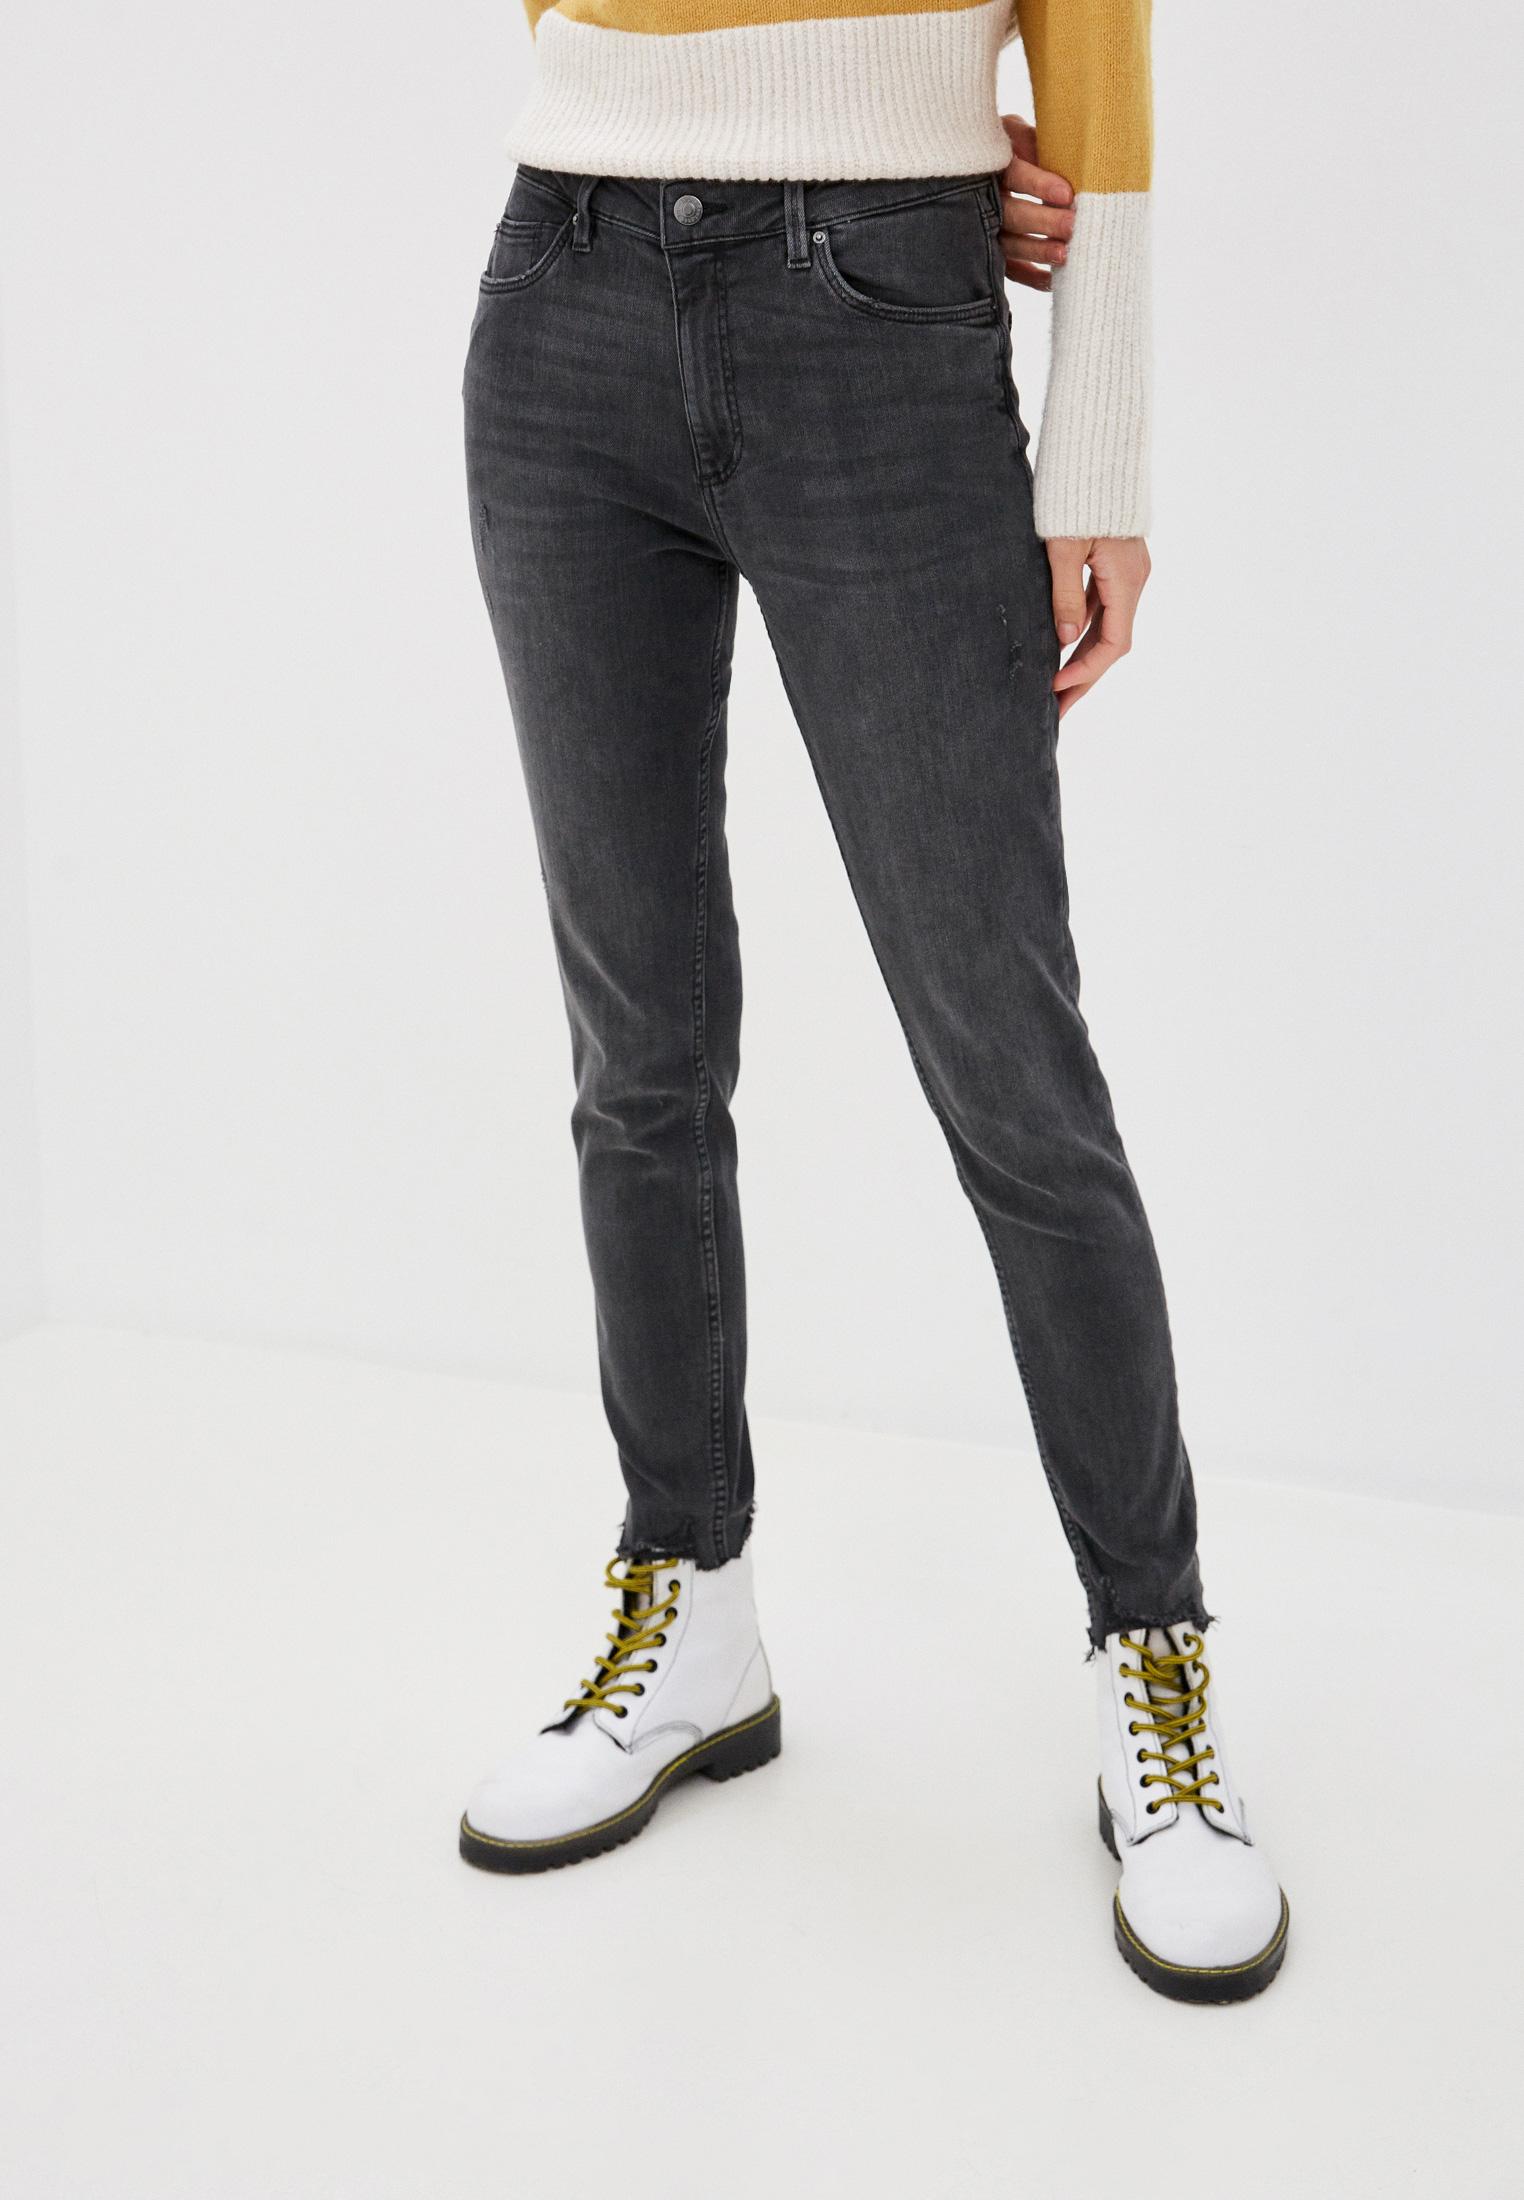 Зауженные джинсы Q/S designed by 510.12.009.26.180.20